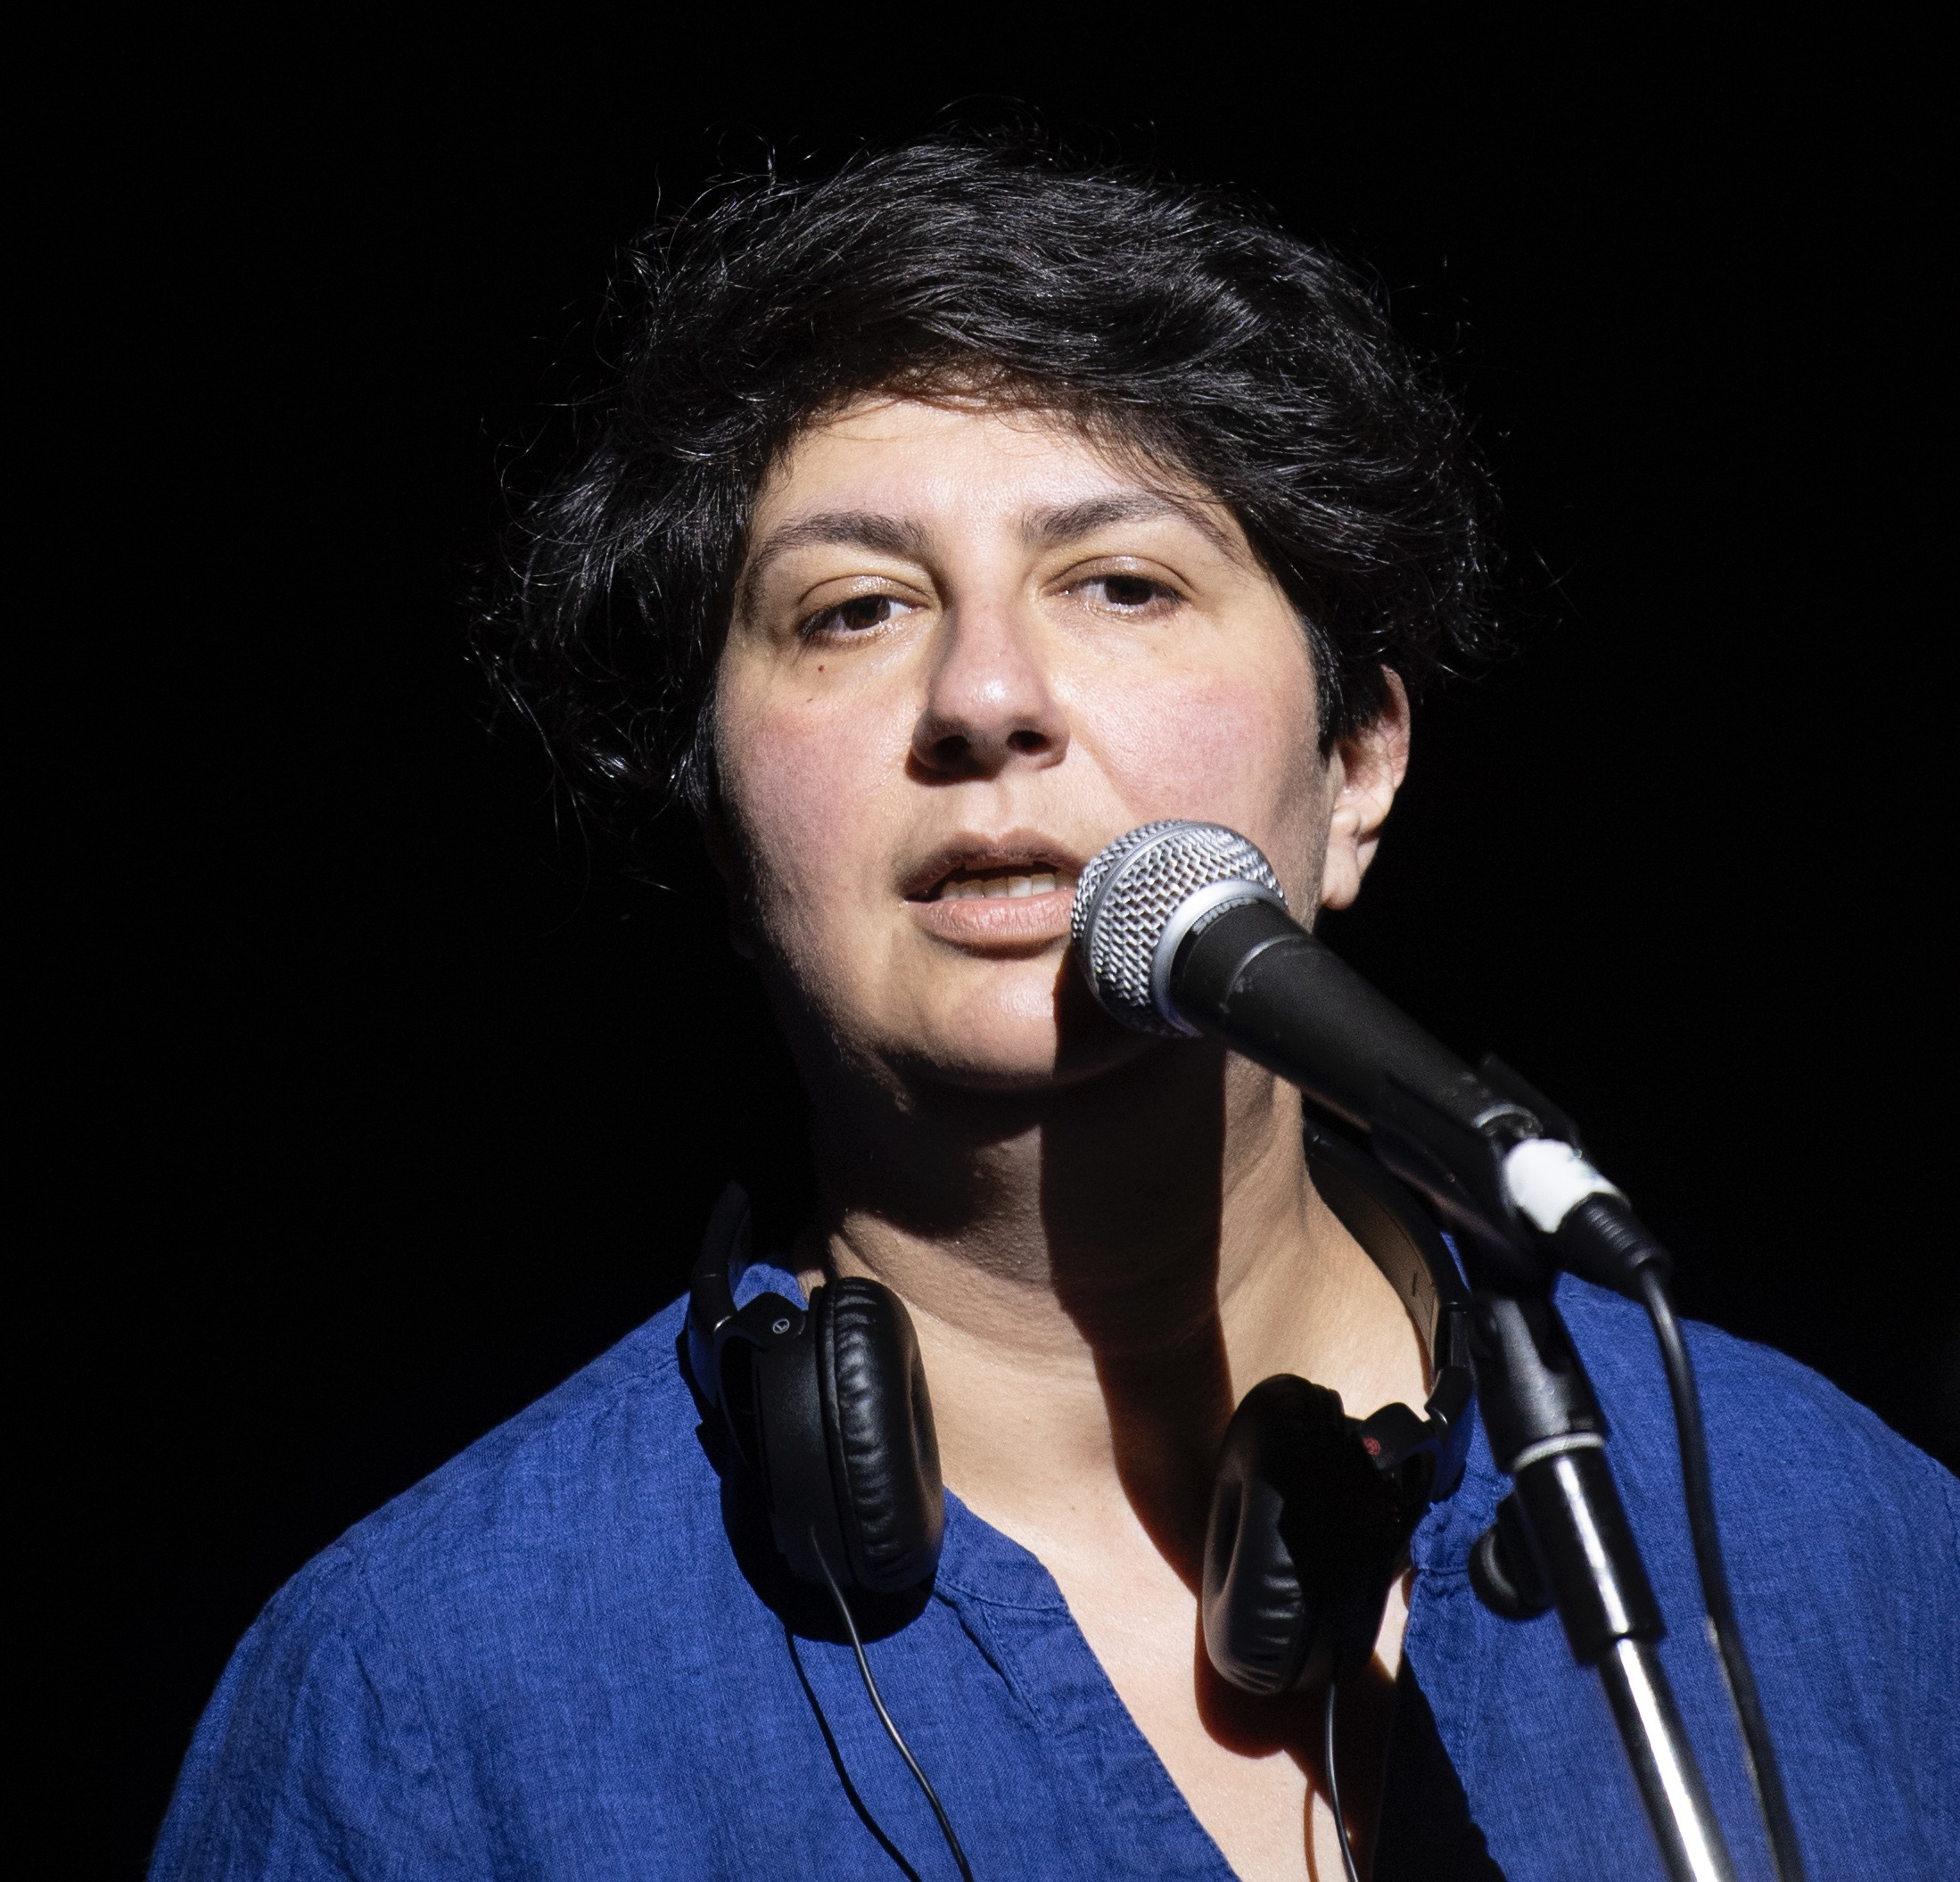 Nazli Tabatabai-Khatambakhsh standing at a microphone. She has over ear headphones around her neck.